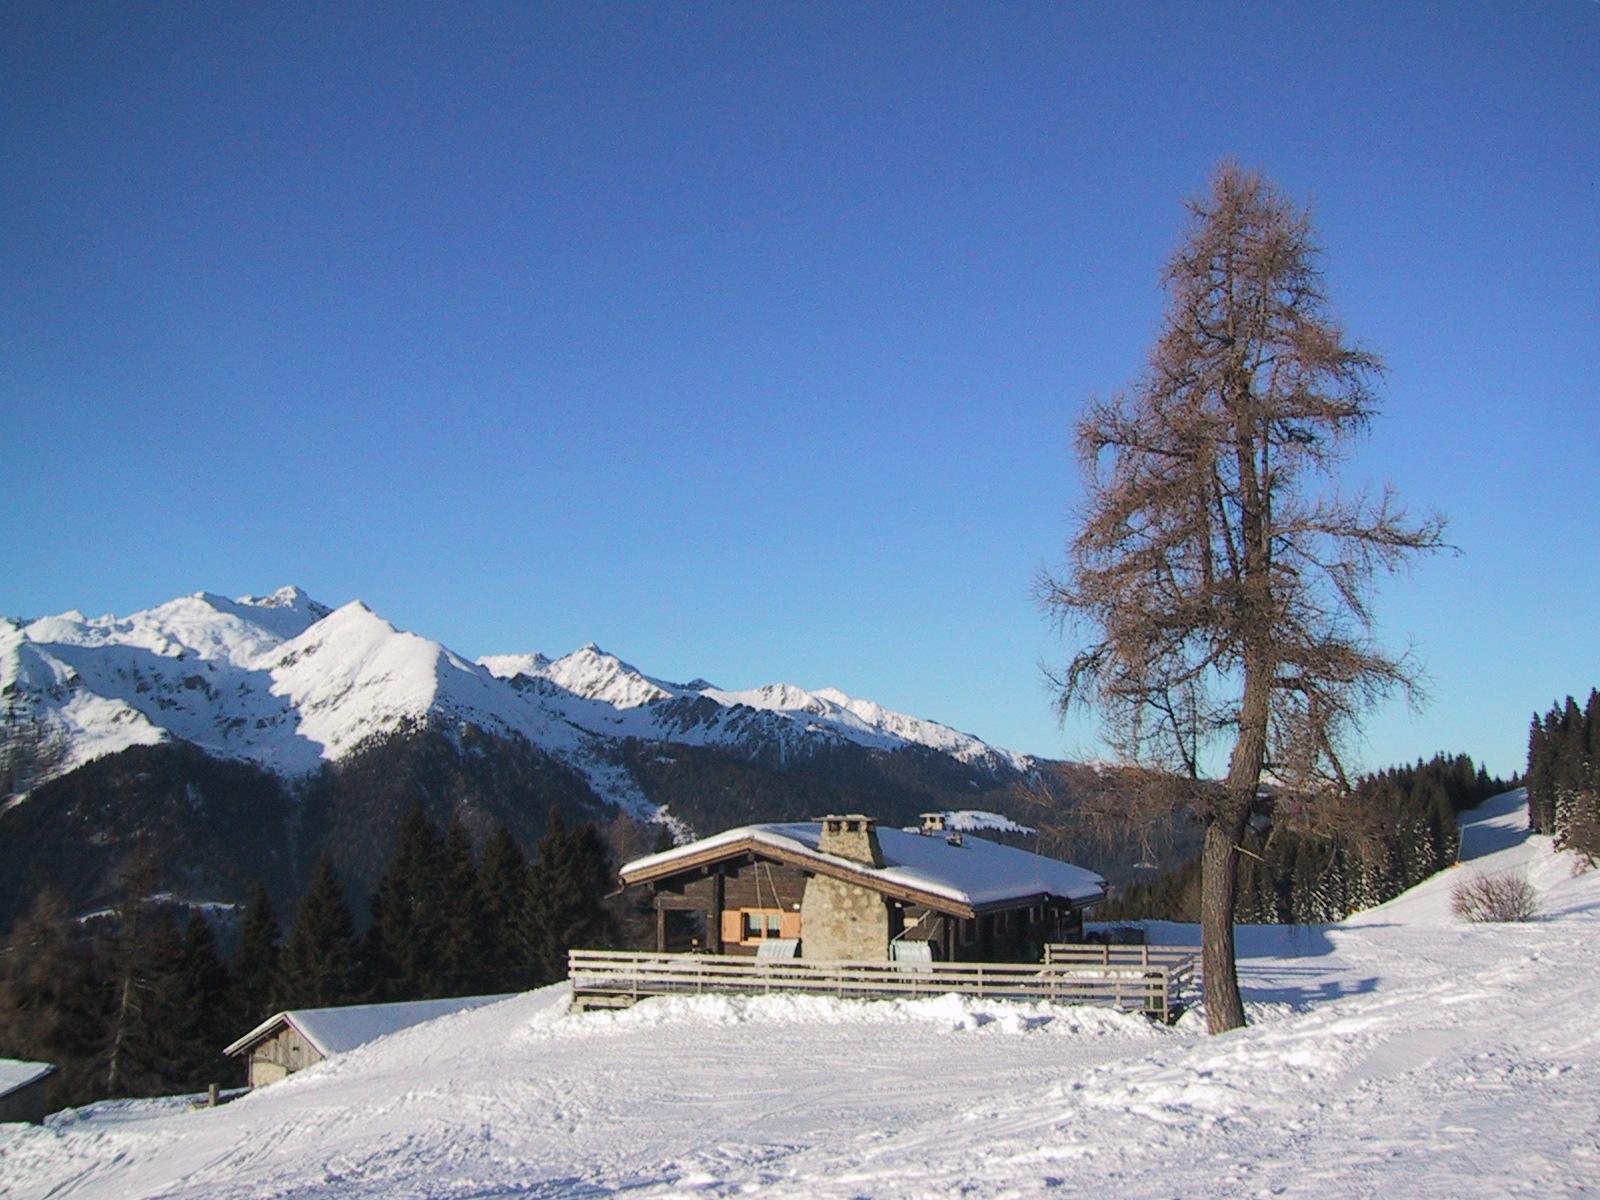 Malga Cioca alpine shelter in italy